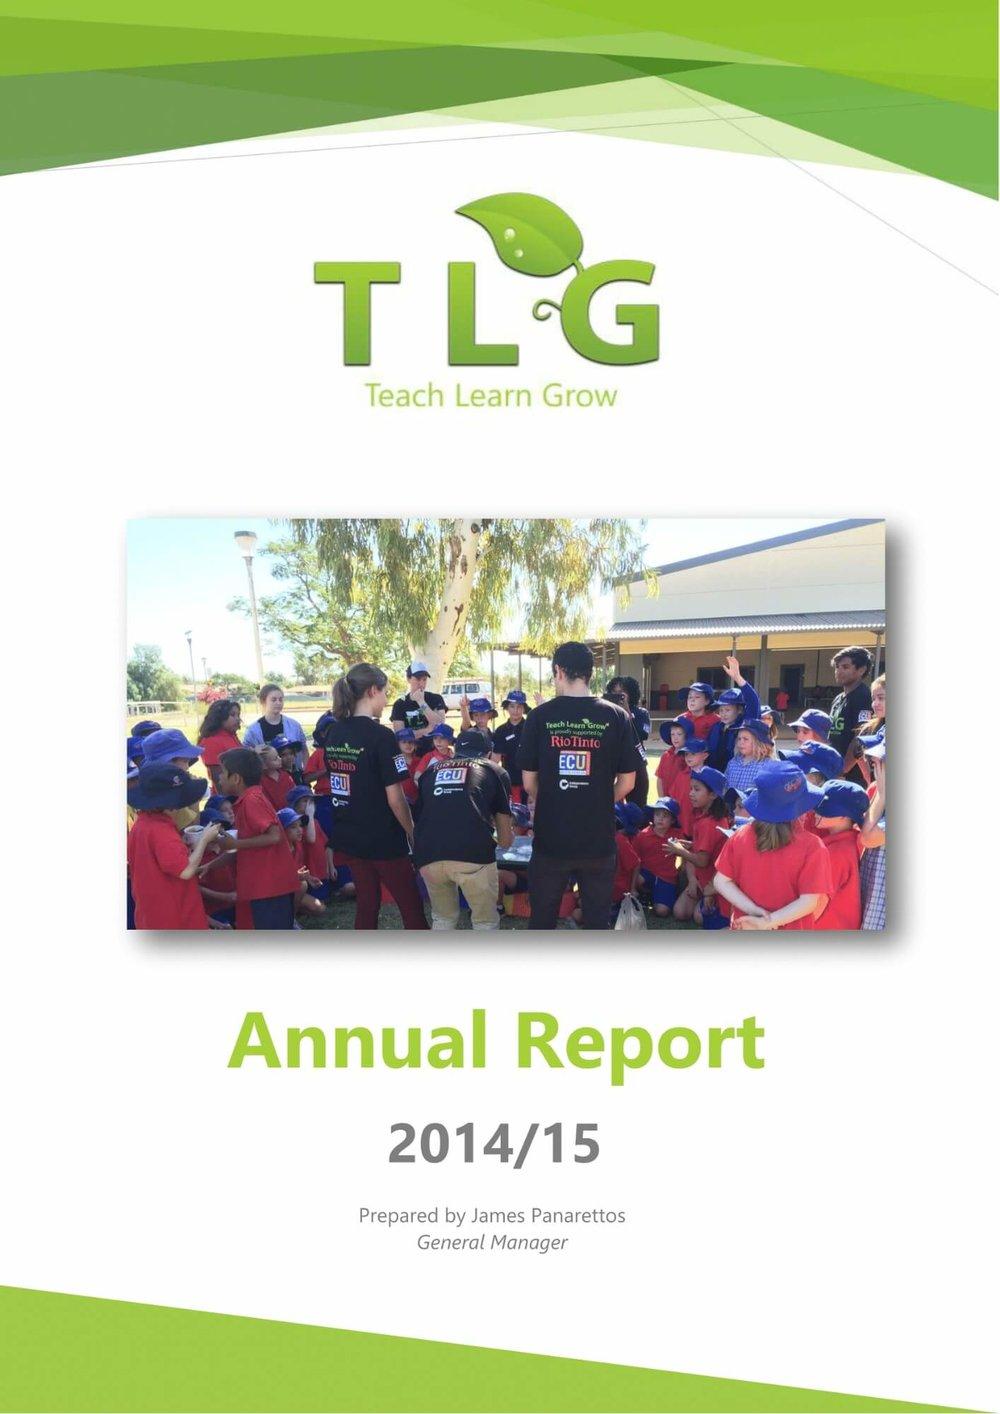 tlg-annual-report-FY14-01.jpg